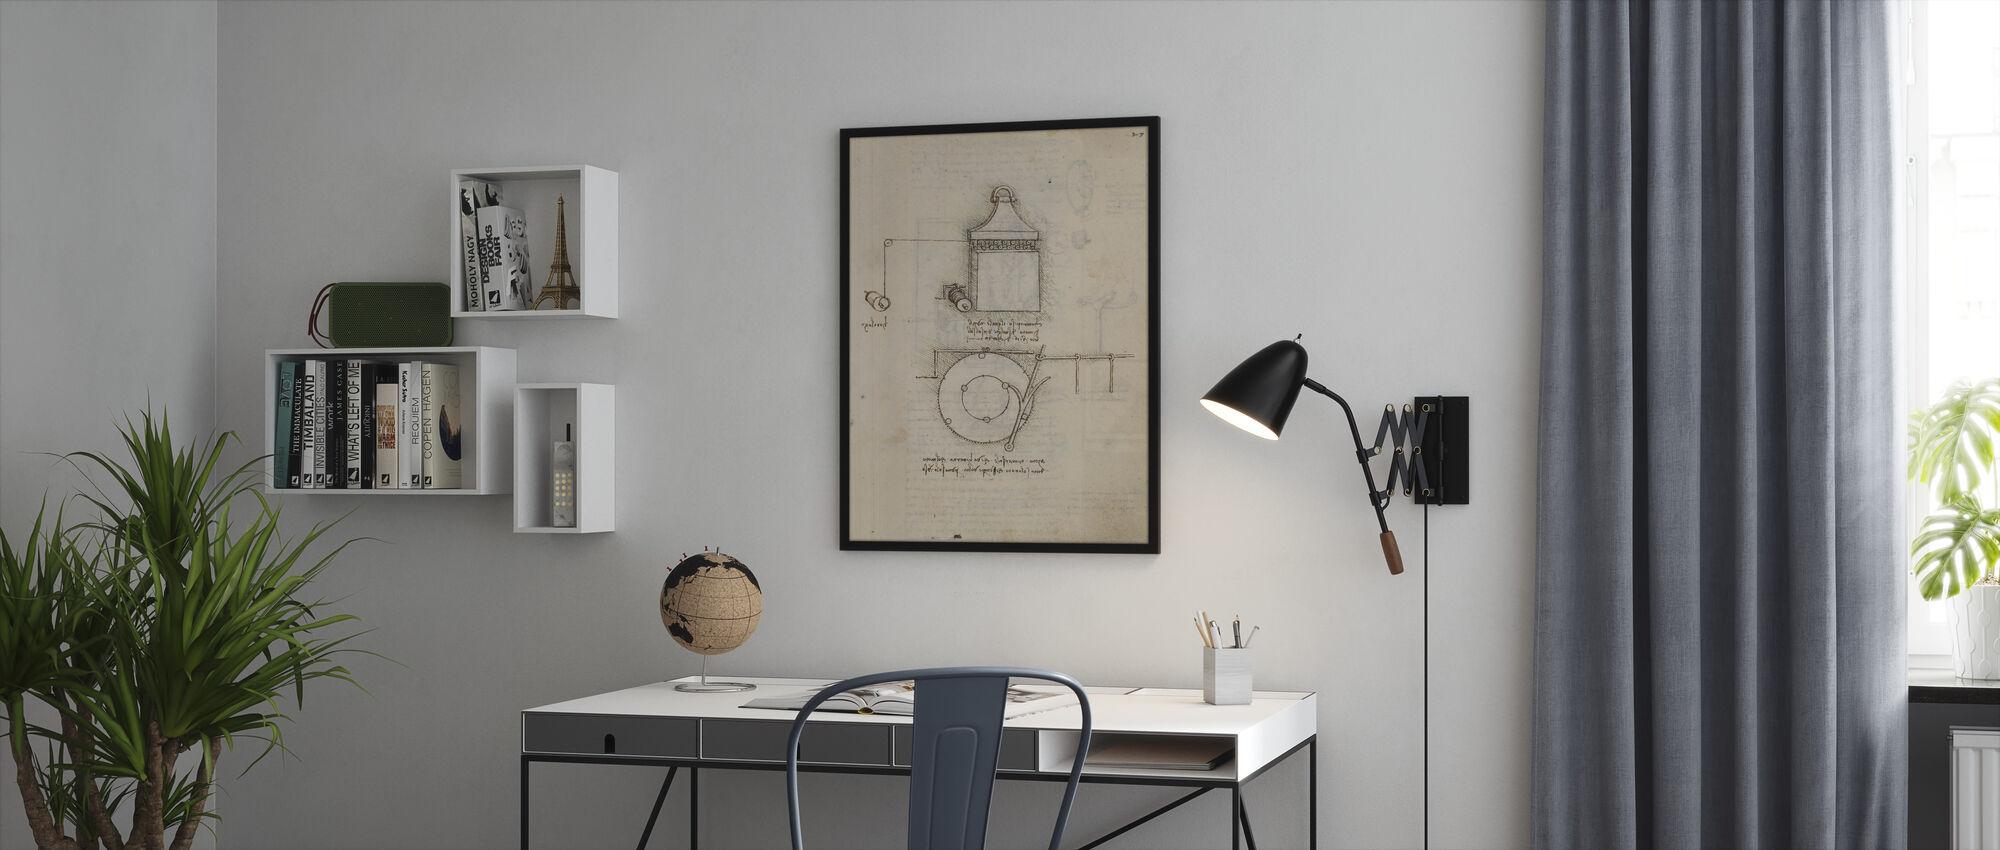 Pulley System - Leonardo Da Vinci - Framed print - Office